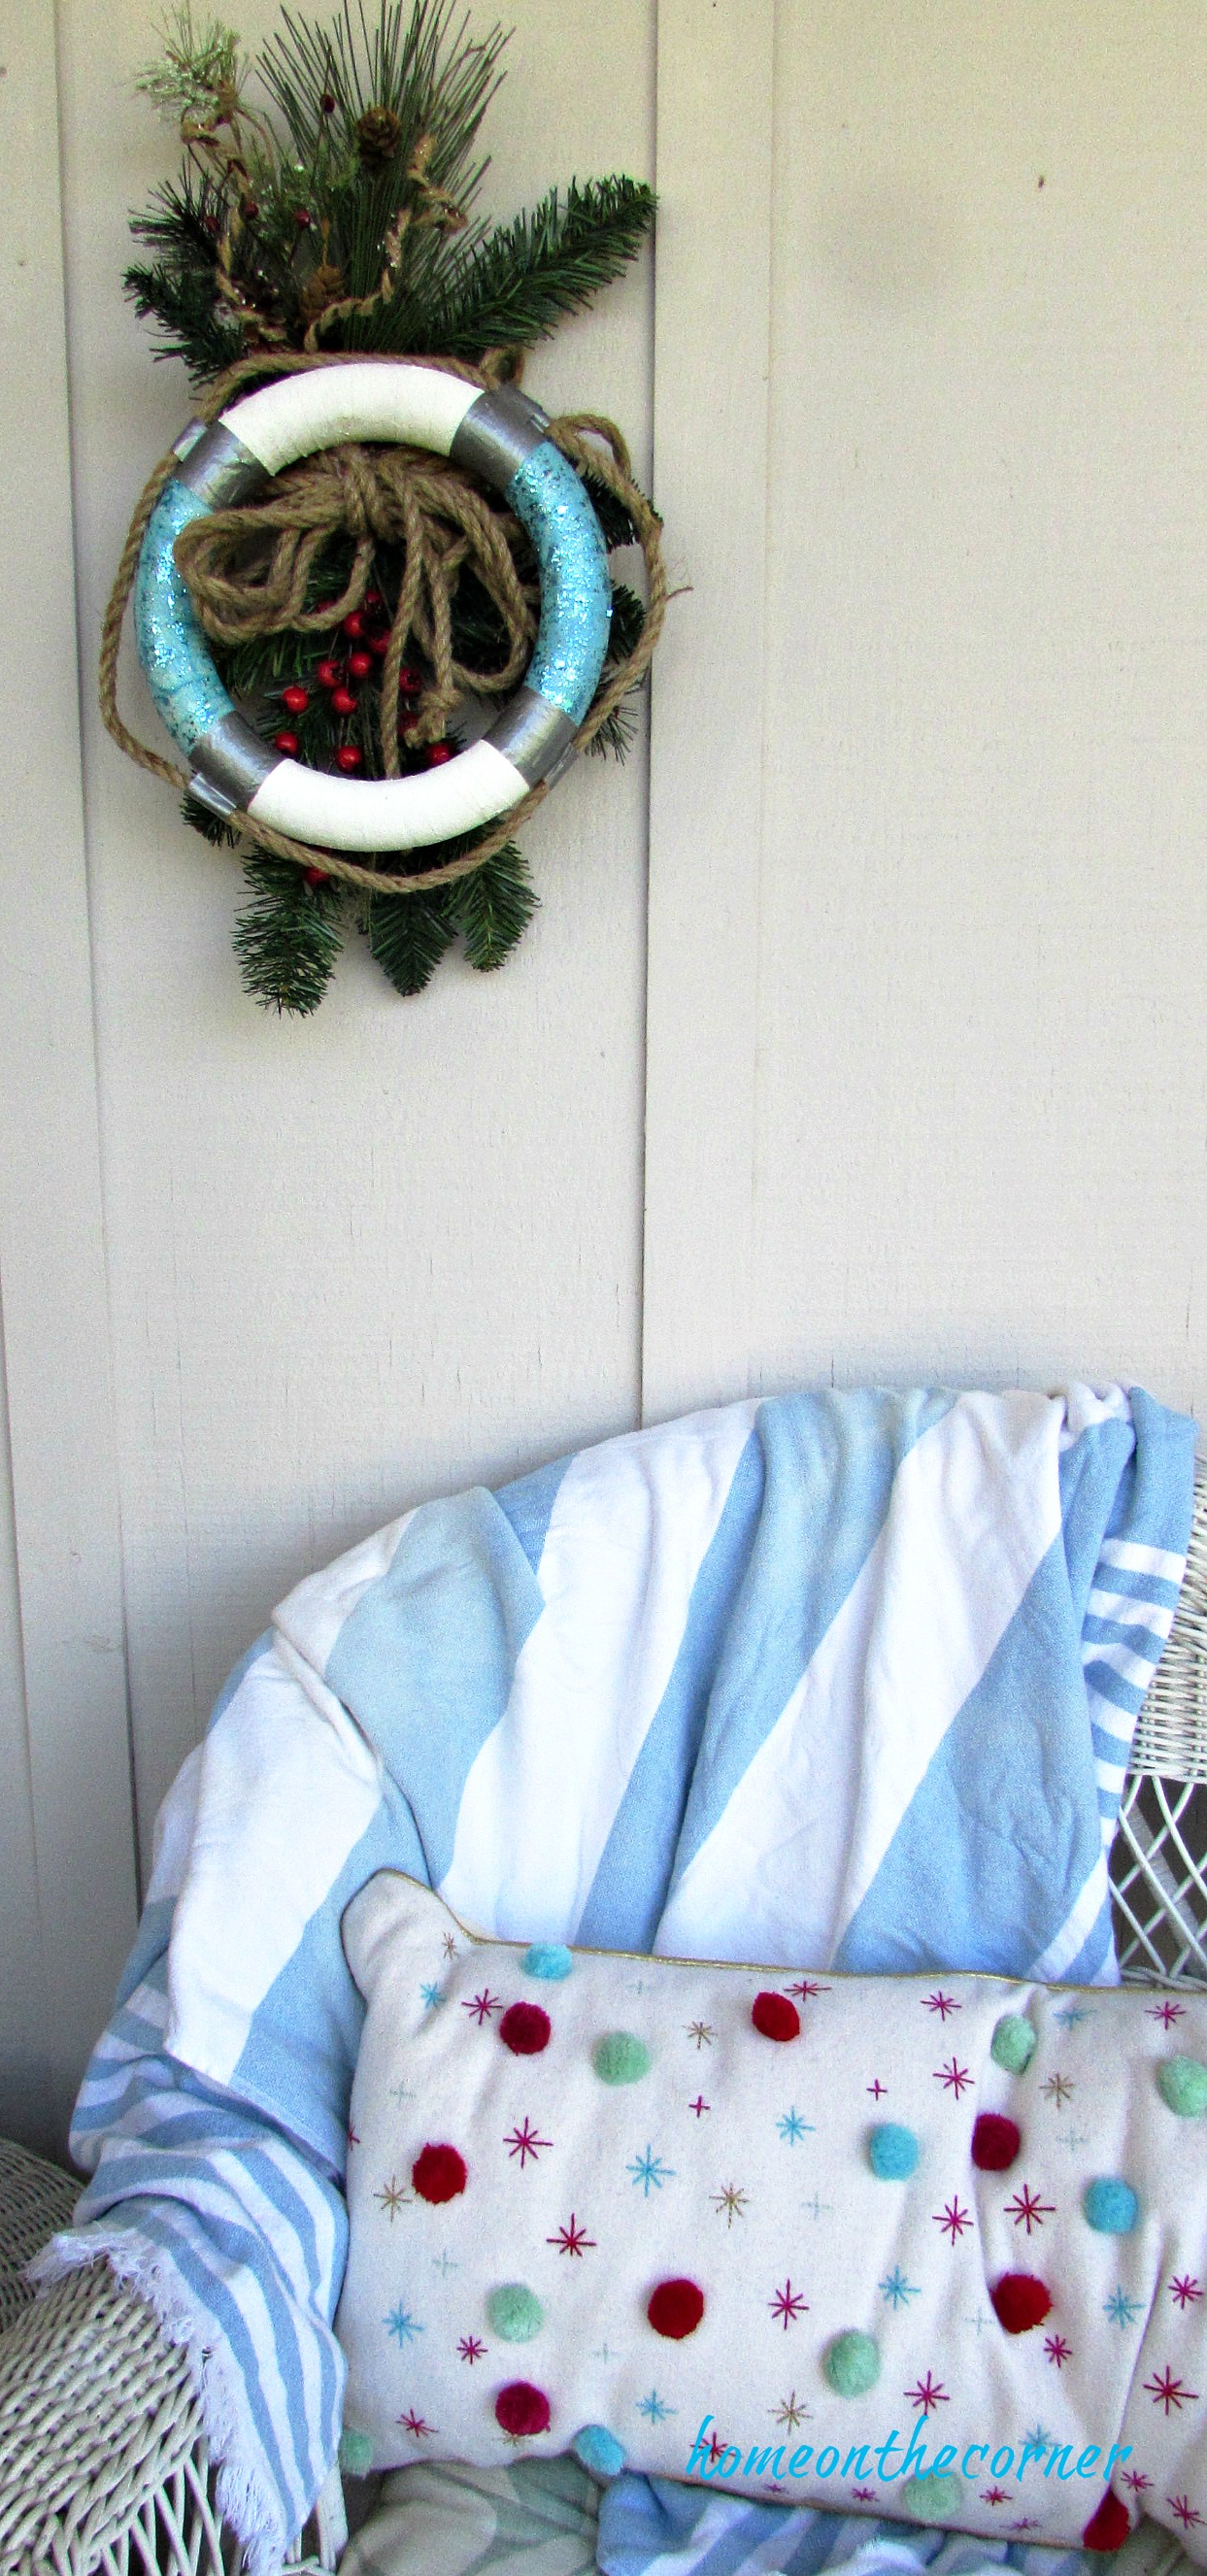 christmas wreath coastal buoy, throw and pillow